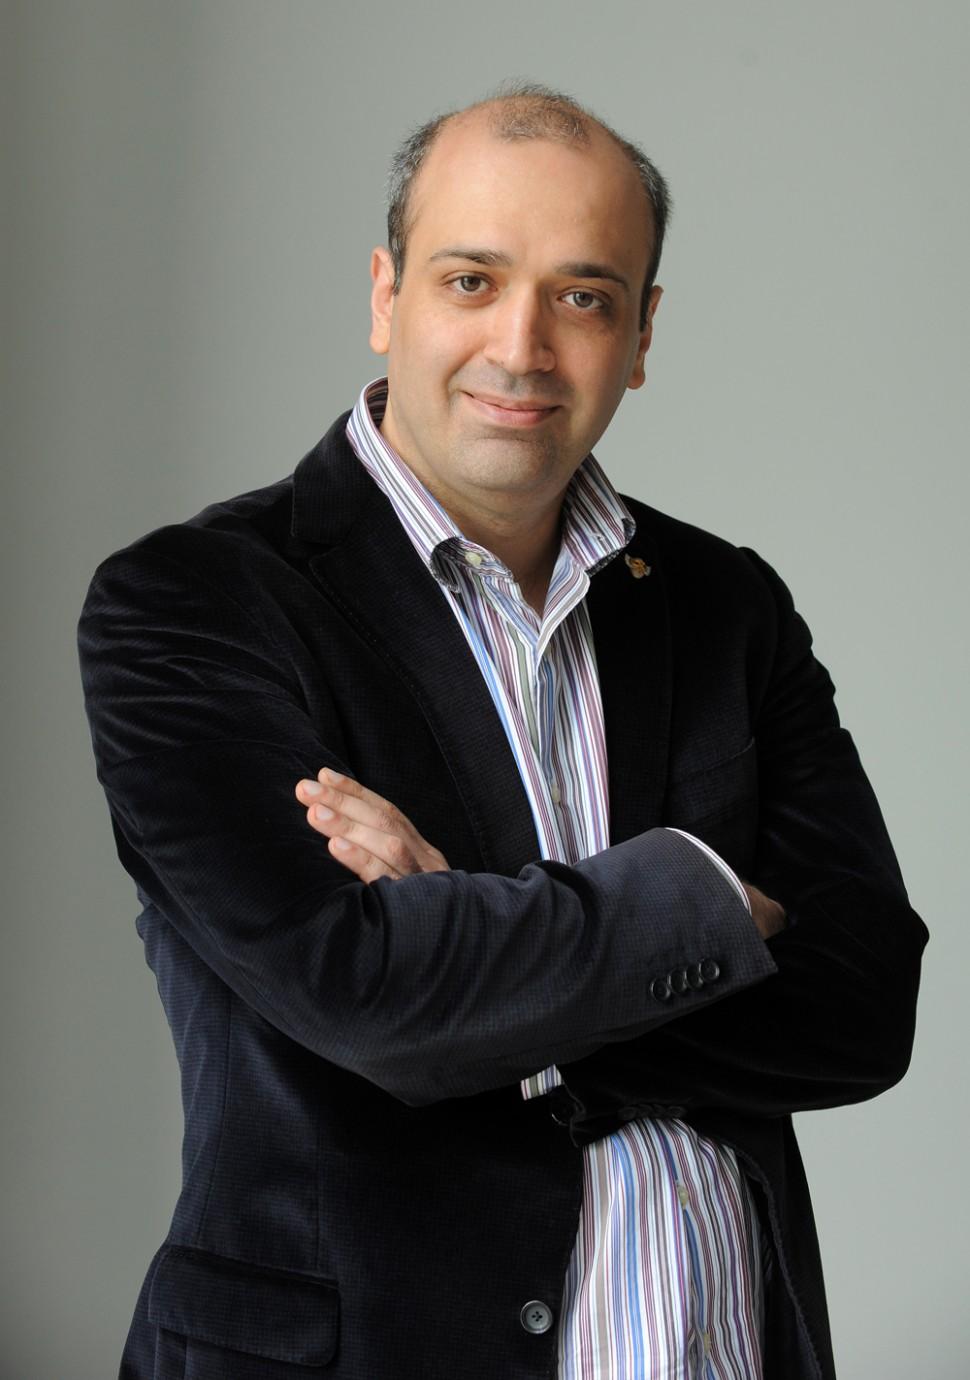 Исаакян Георгий Георгиевич